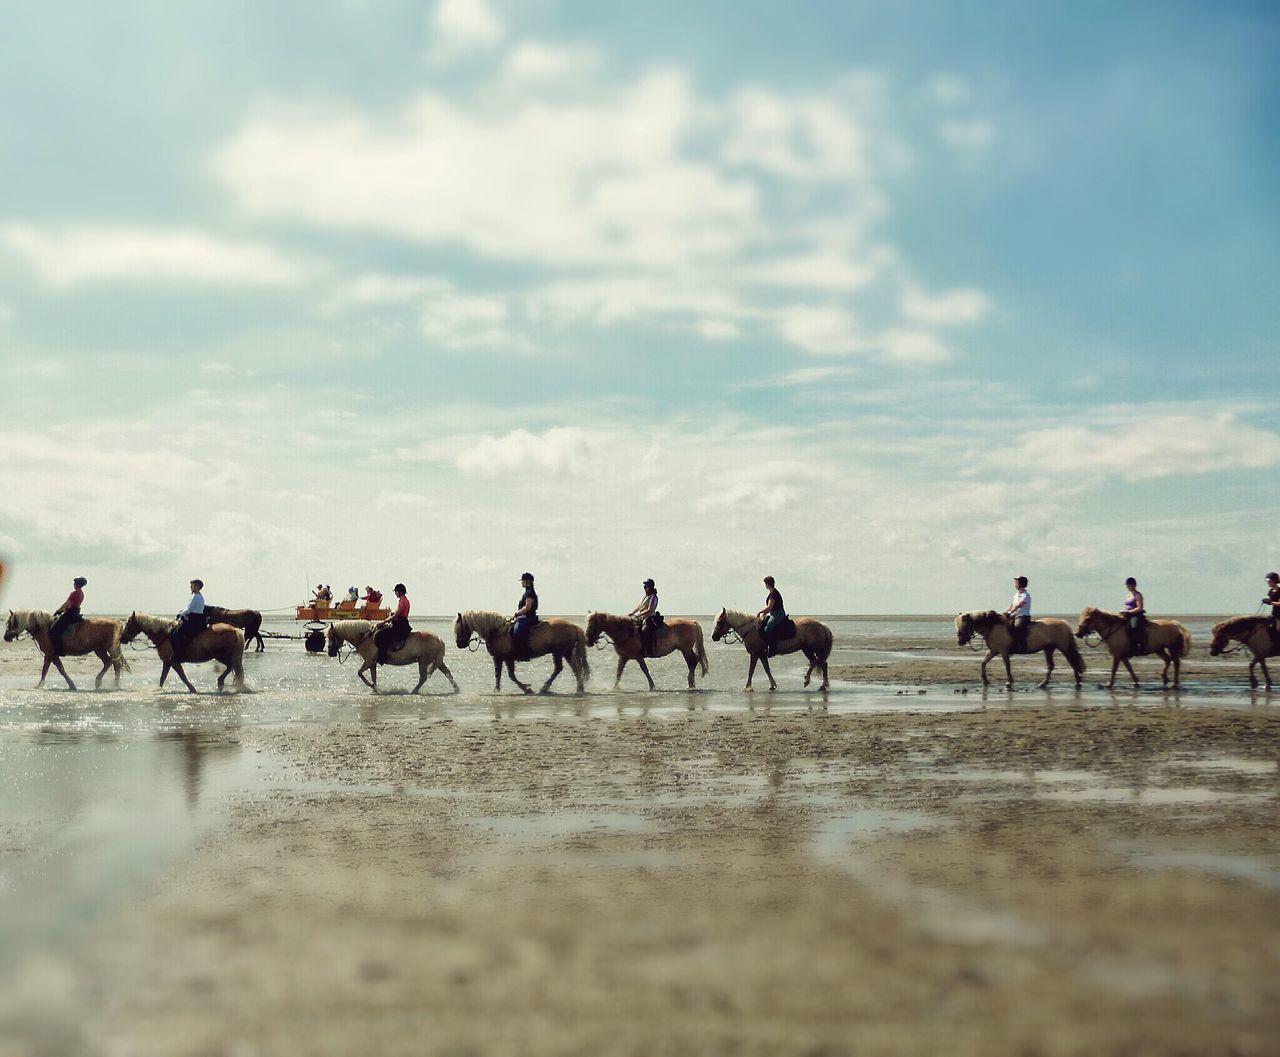 On A Health Kick Animals Horses Ride A Horse EyeEm Best Shots EyeEm Nature Lover Sea Karavan Harmony Beauty